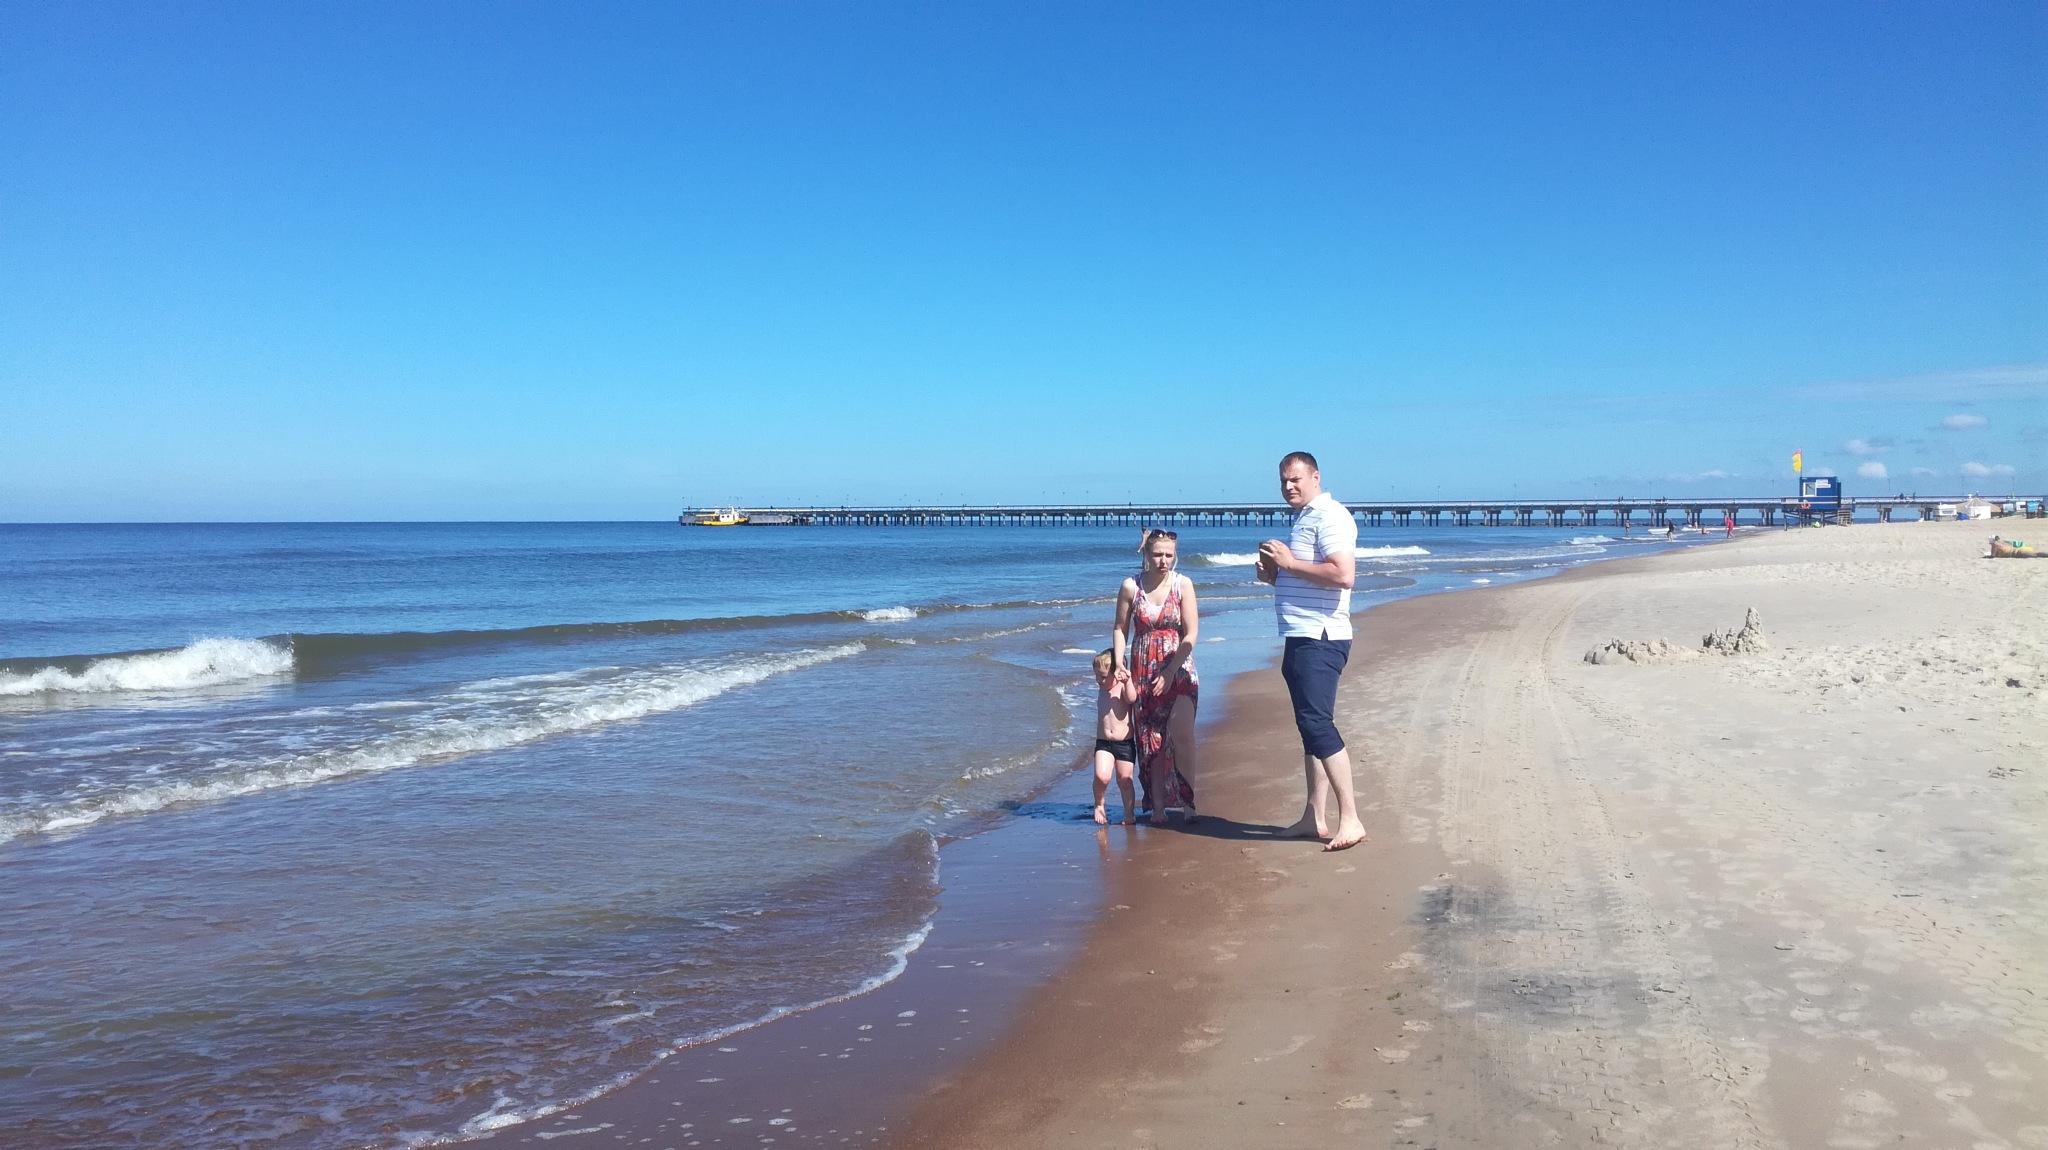 Near the sea by uzkuraitiene62